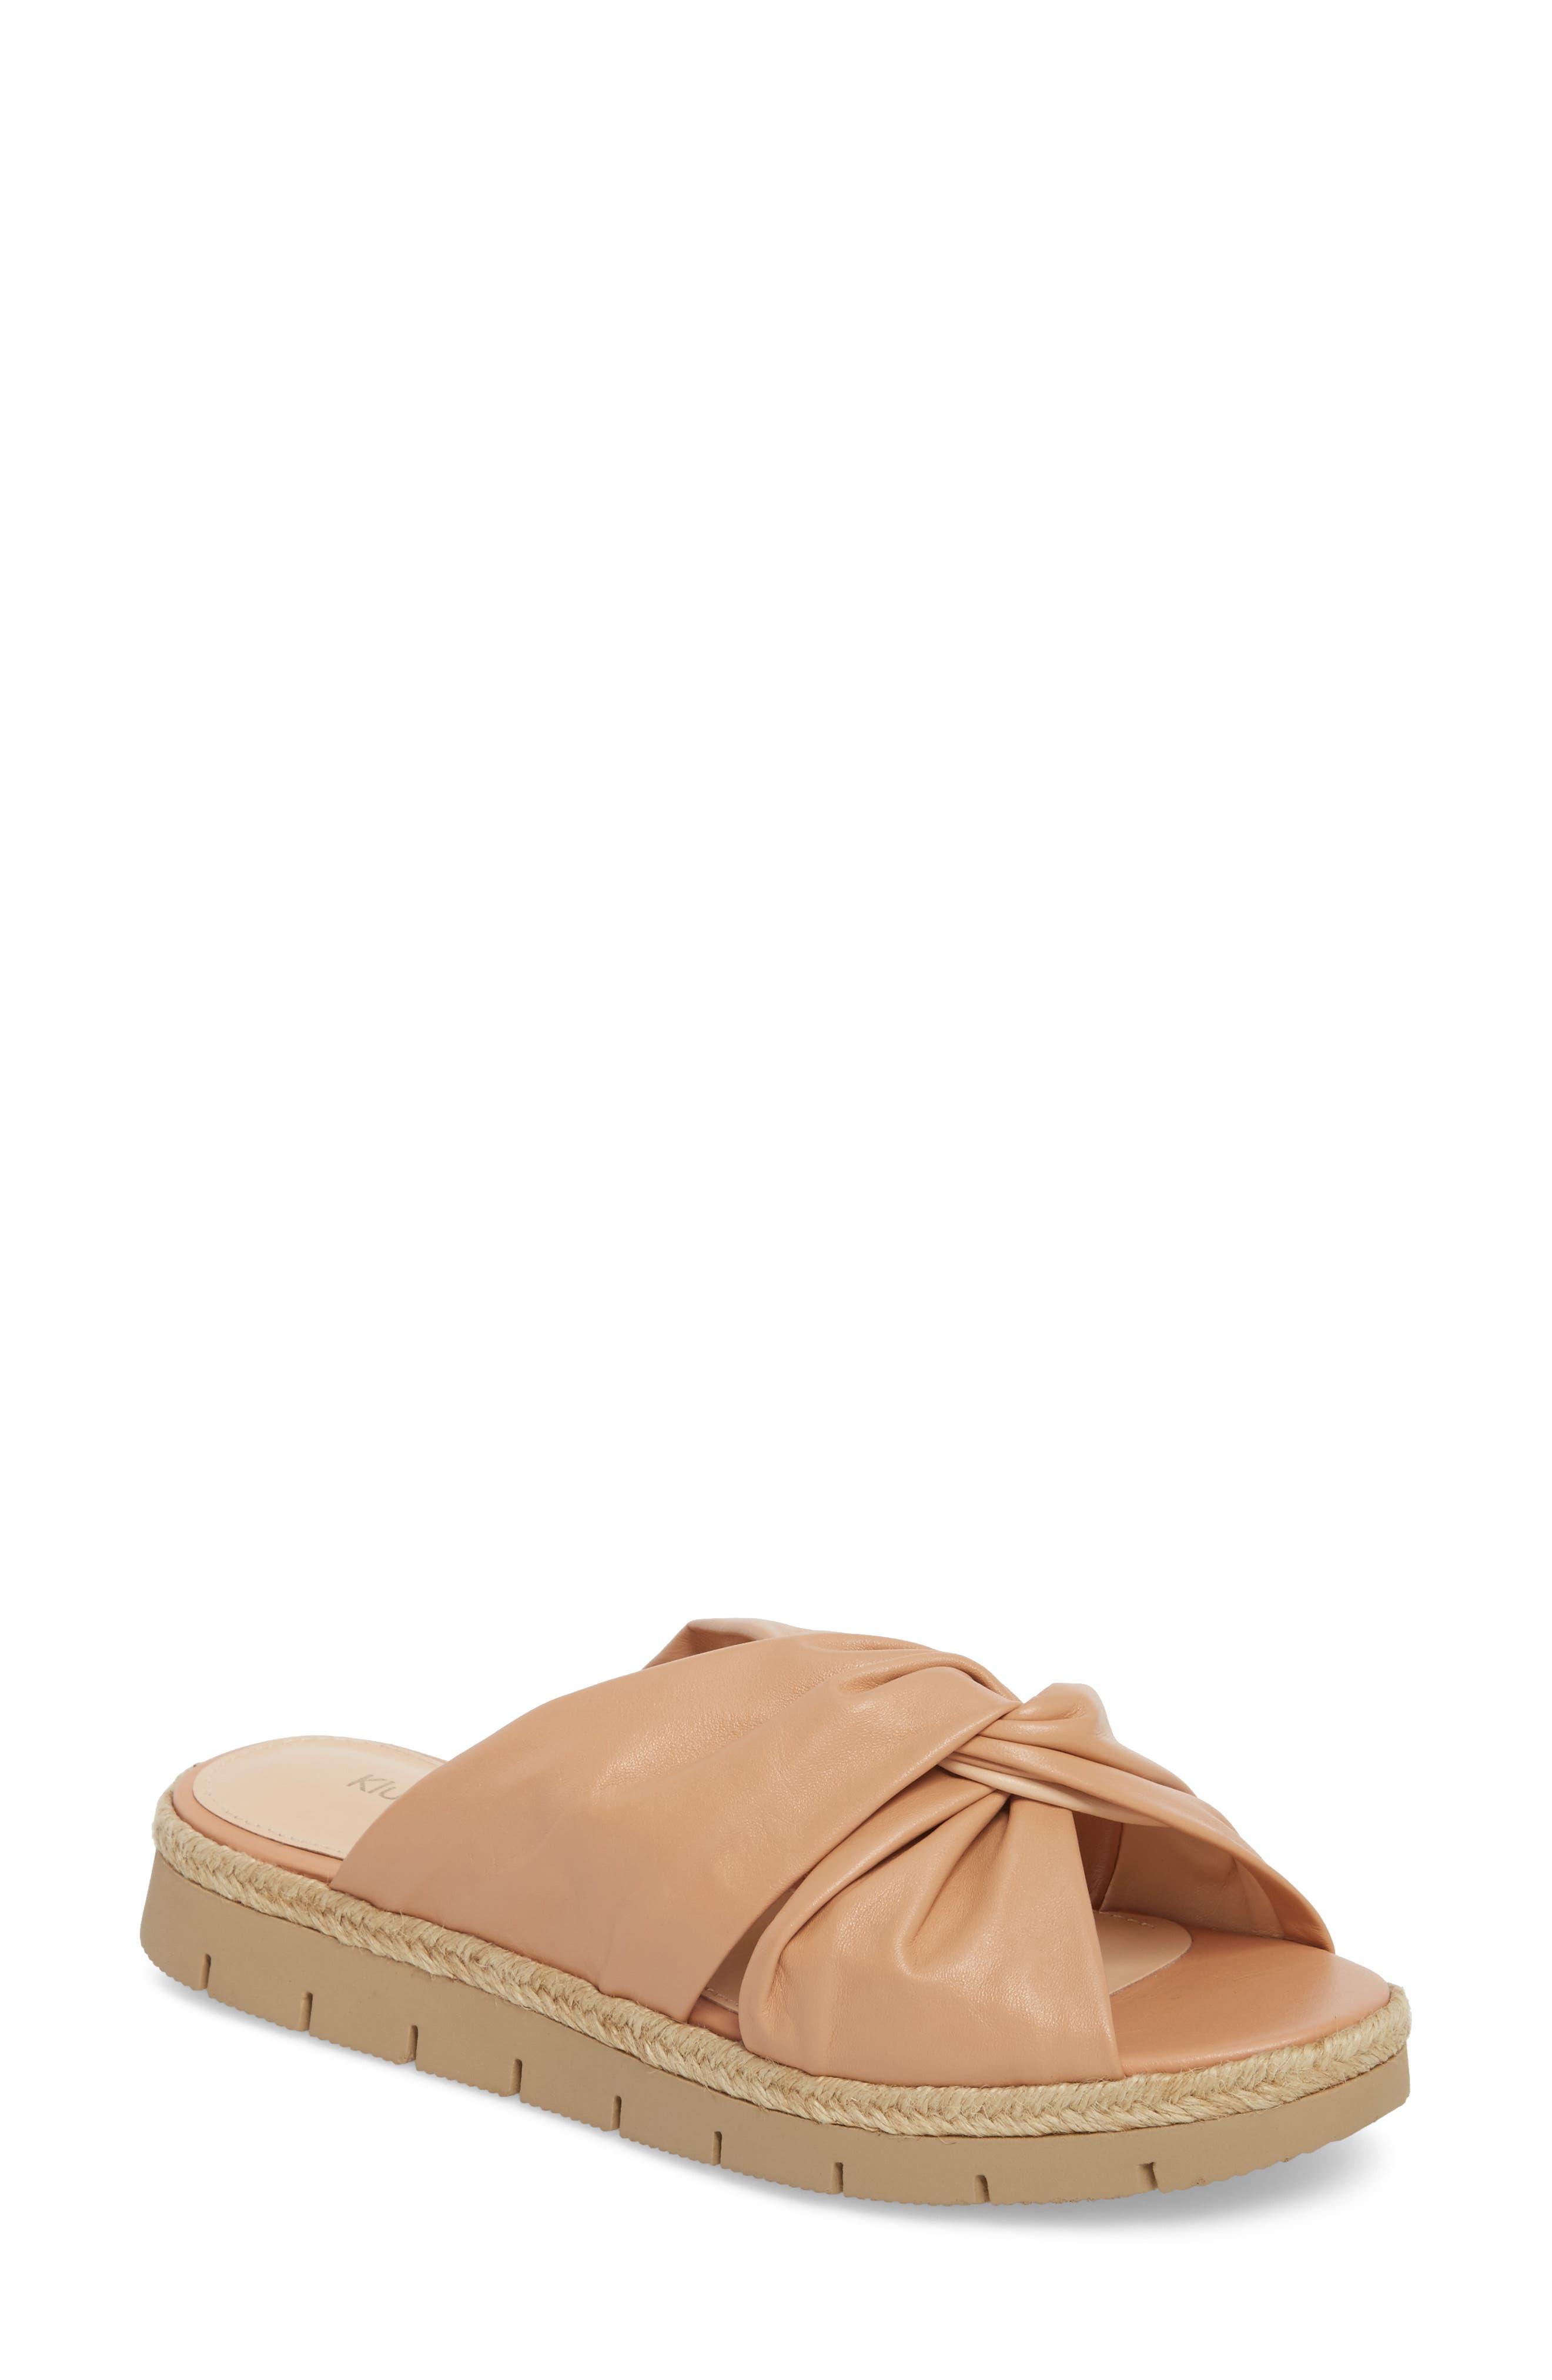 Charlie Slide Sandal,                             Main thumbnail 1, color,                             Peach Leather